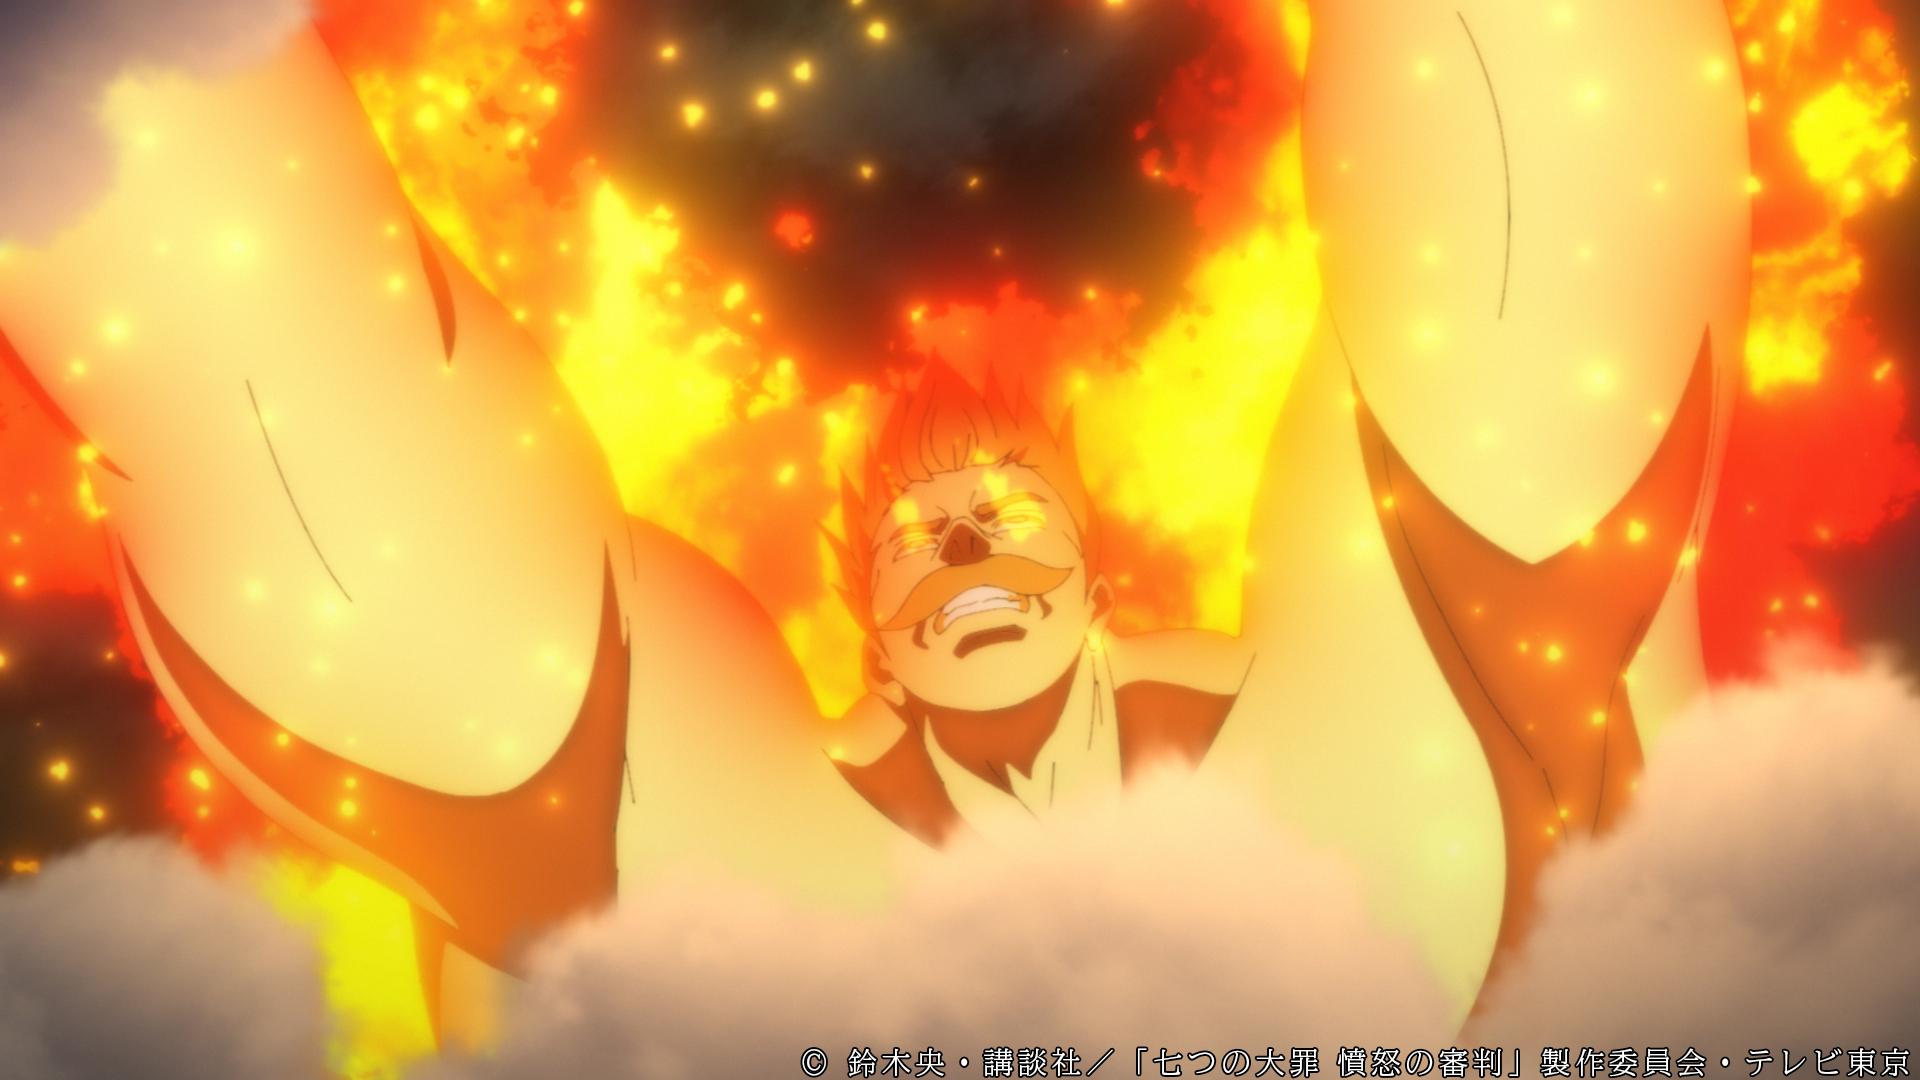 (C) 鈴木央・講談社/「七つの大罪 憤怒の審判」製作委員会・テレビ東京